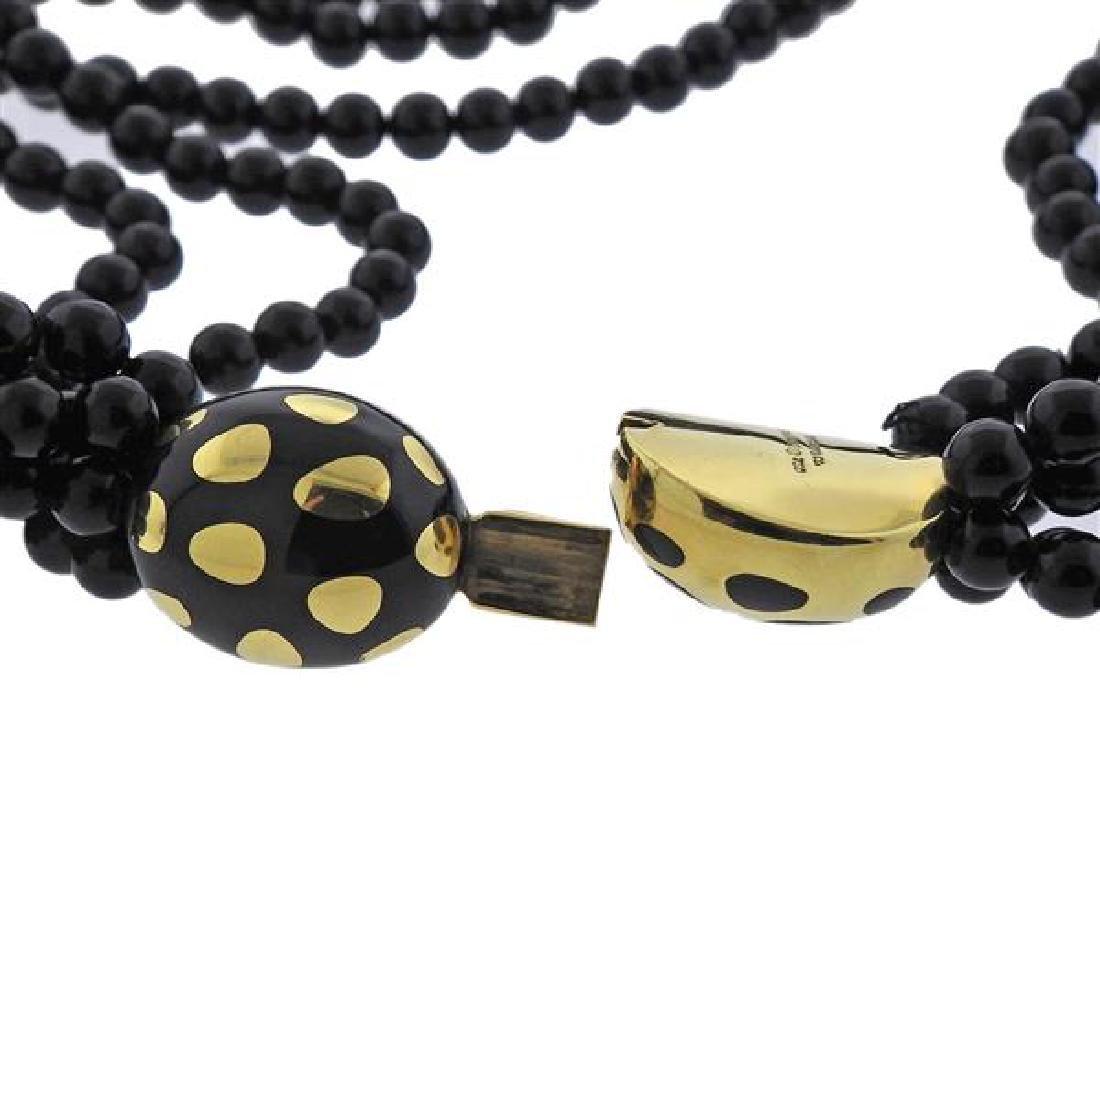 Tiffany & Co Gold Jade Positive Negative Clasp Bead - 5